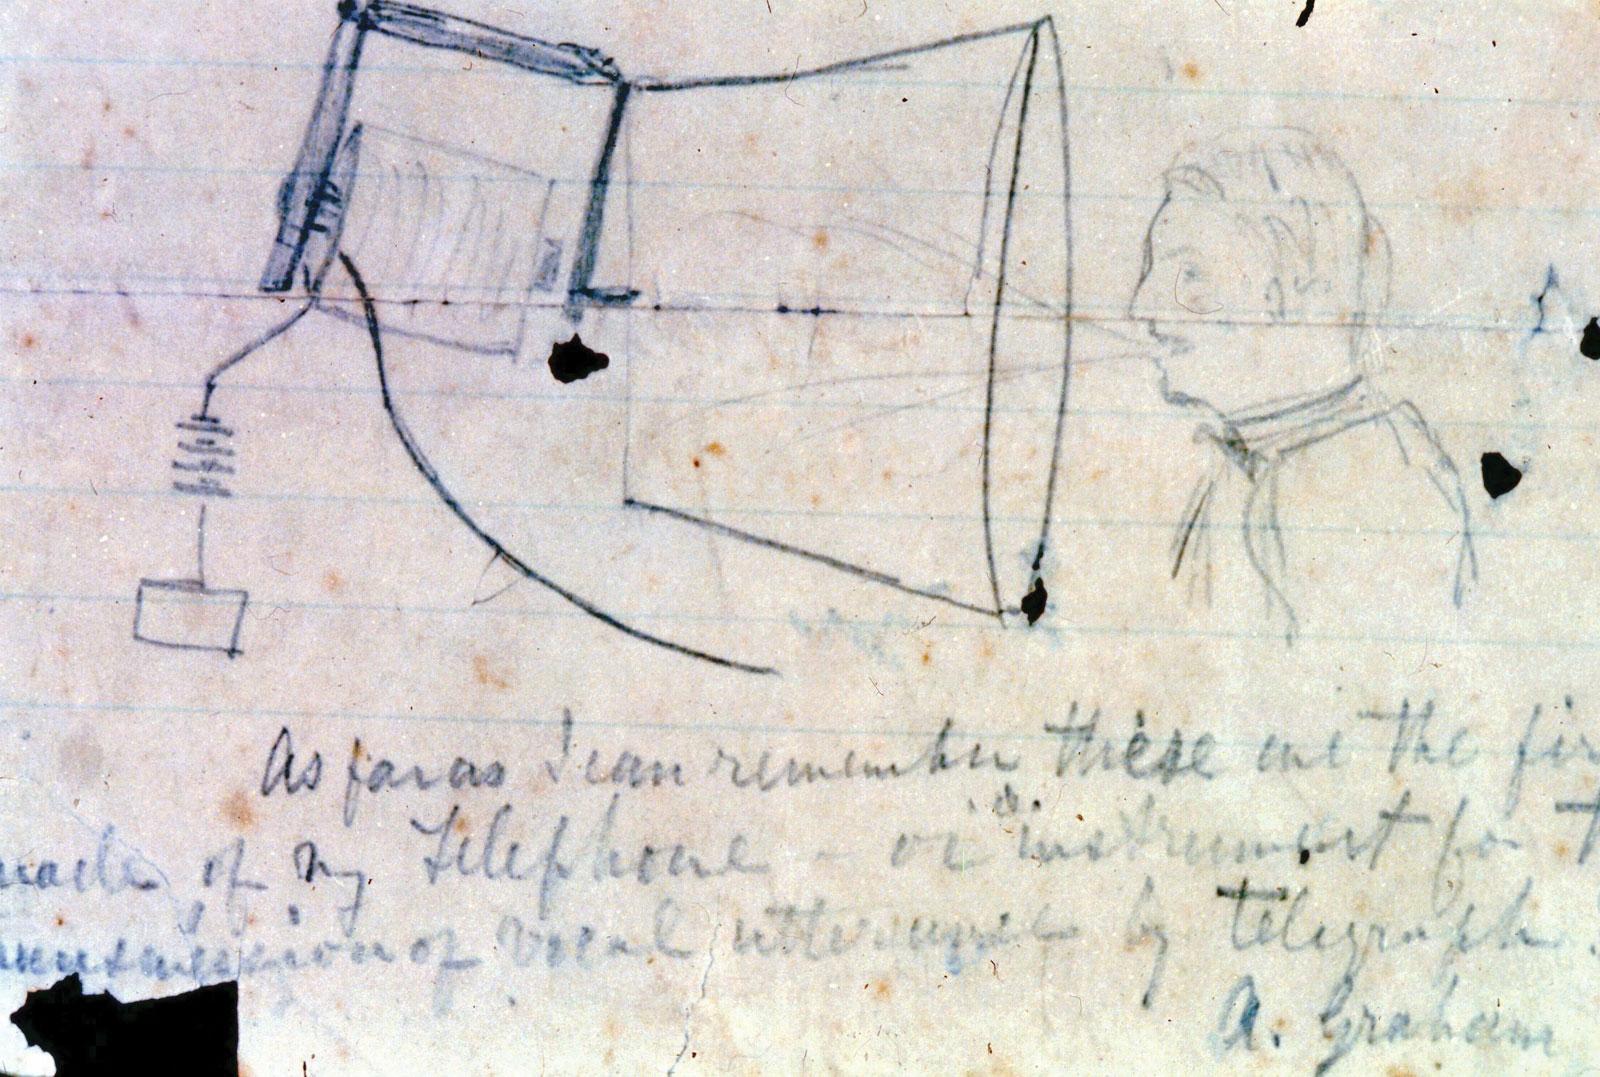 Alexander-Graham-Bell-telephone-study-friends-lecture-February-12-1877.jpg